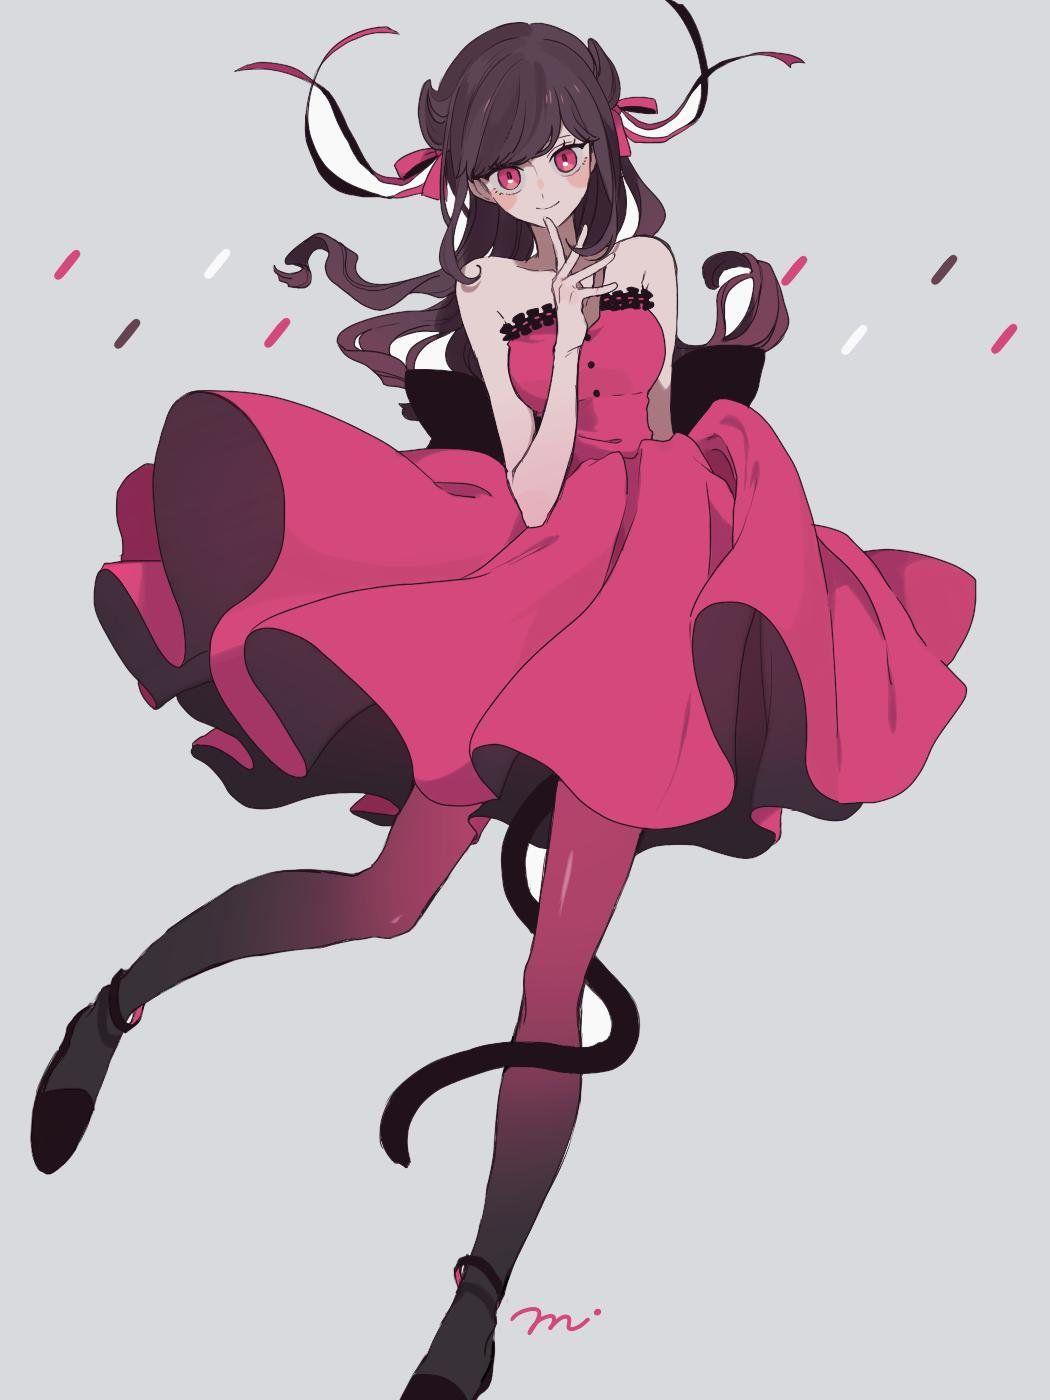 Miya Chinen @rpaqreya in 2021 | Anime funny, Anime, Catboy